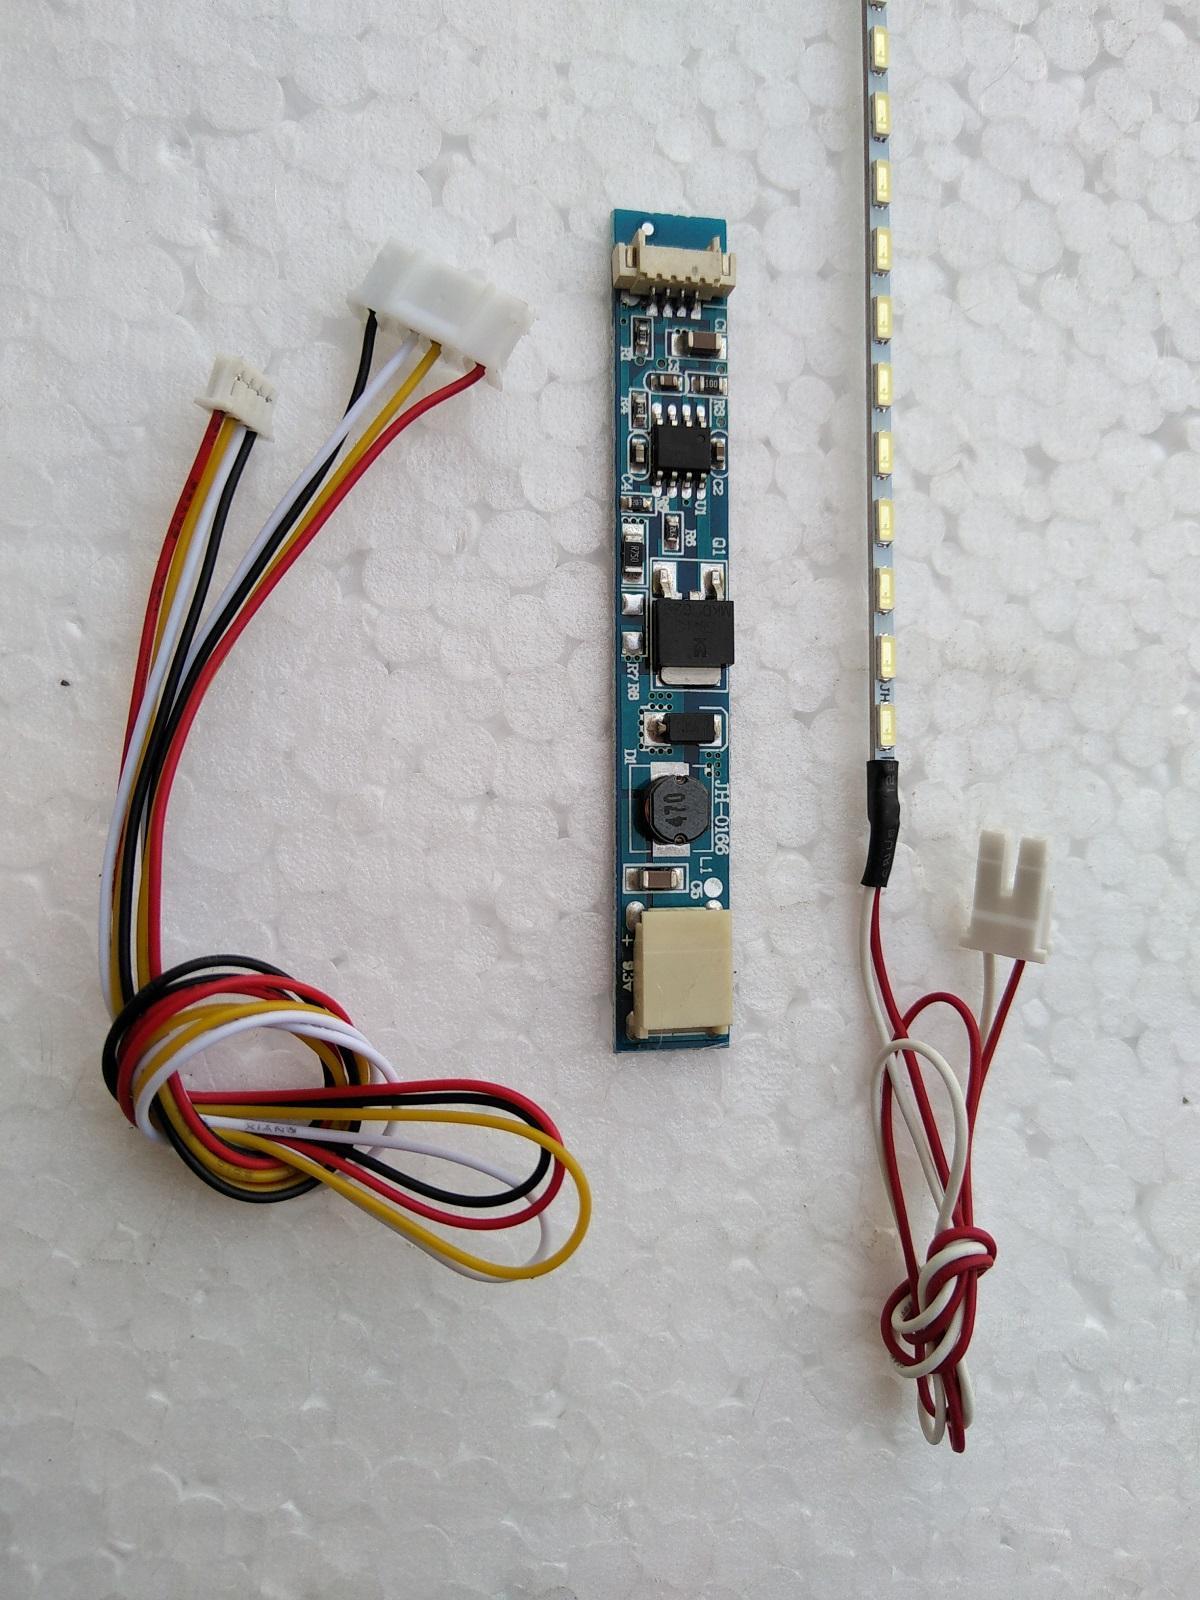 Inverter Lampu LED Backlight Layar Panel Laptop Monitor TV Ganti LCD CCFL Neon 10 Sampai 17 Inch 380 Mm 4014 X 63 CA 166 Isi 3